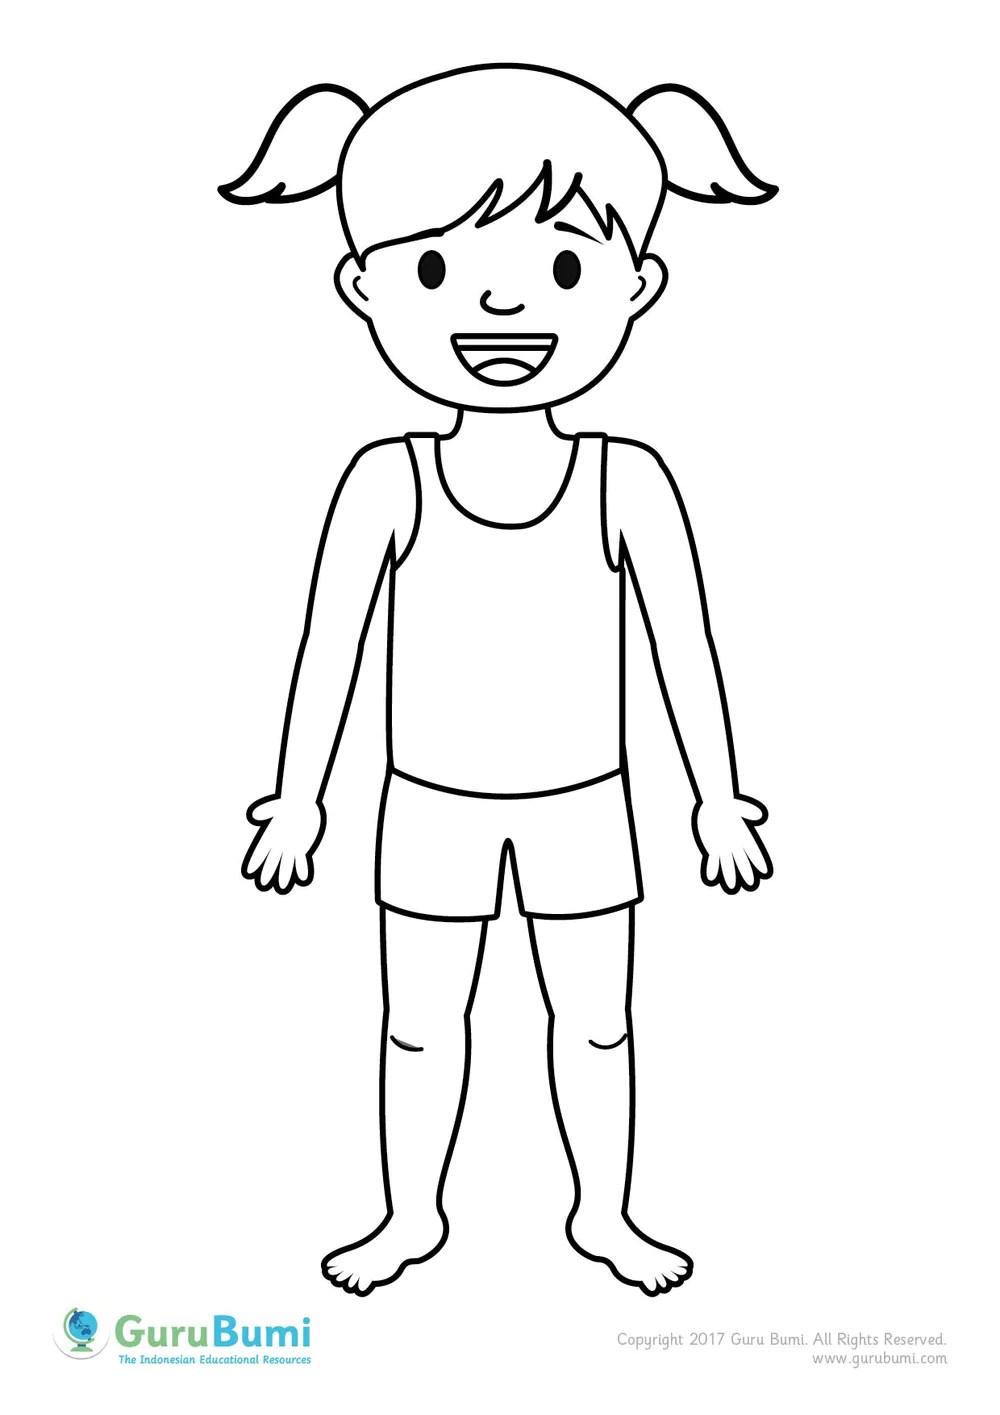 Contoh Gambar Mewarnai Gambar Anggota Keluarga KataUcap